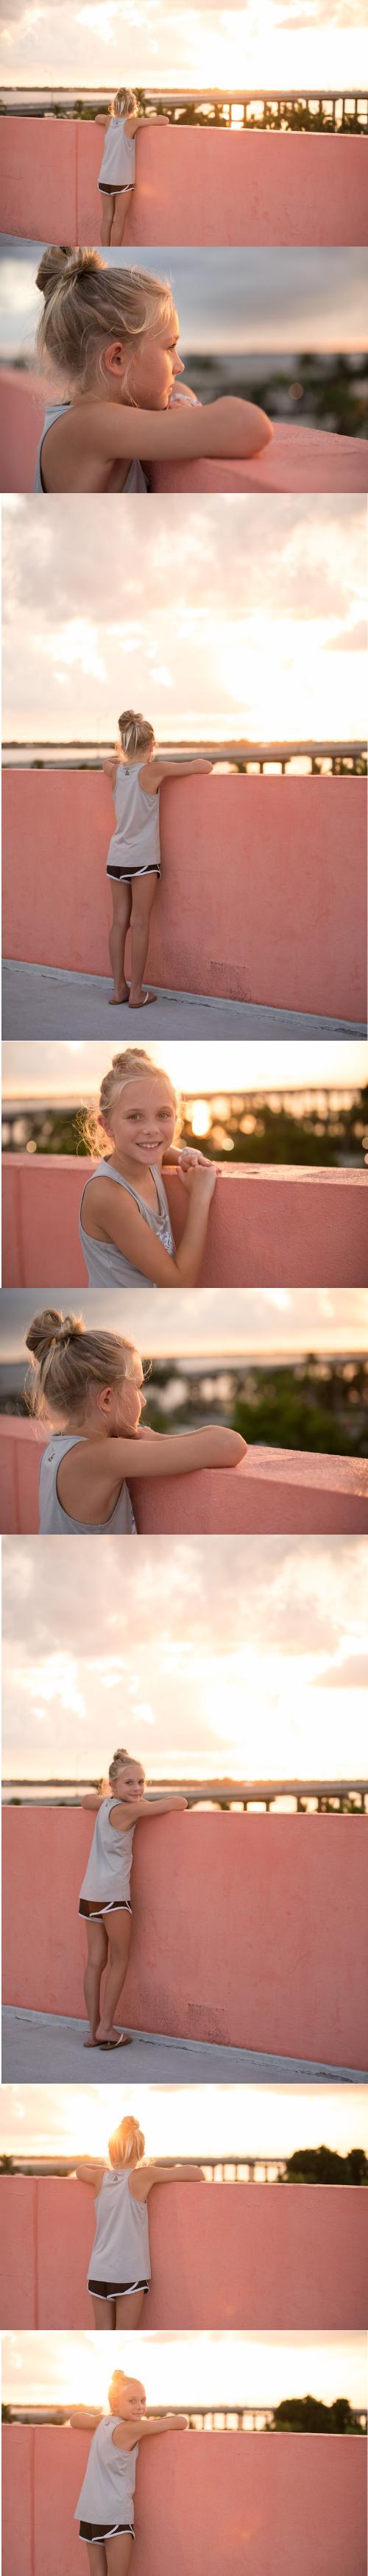 Elizabeth Ruth Photograph + Sanibel Island Florida Photographer + Cape Coral Florida Photography